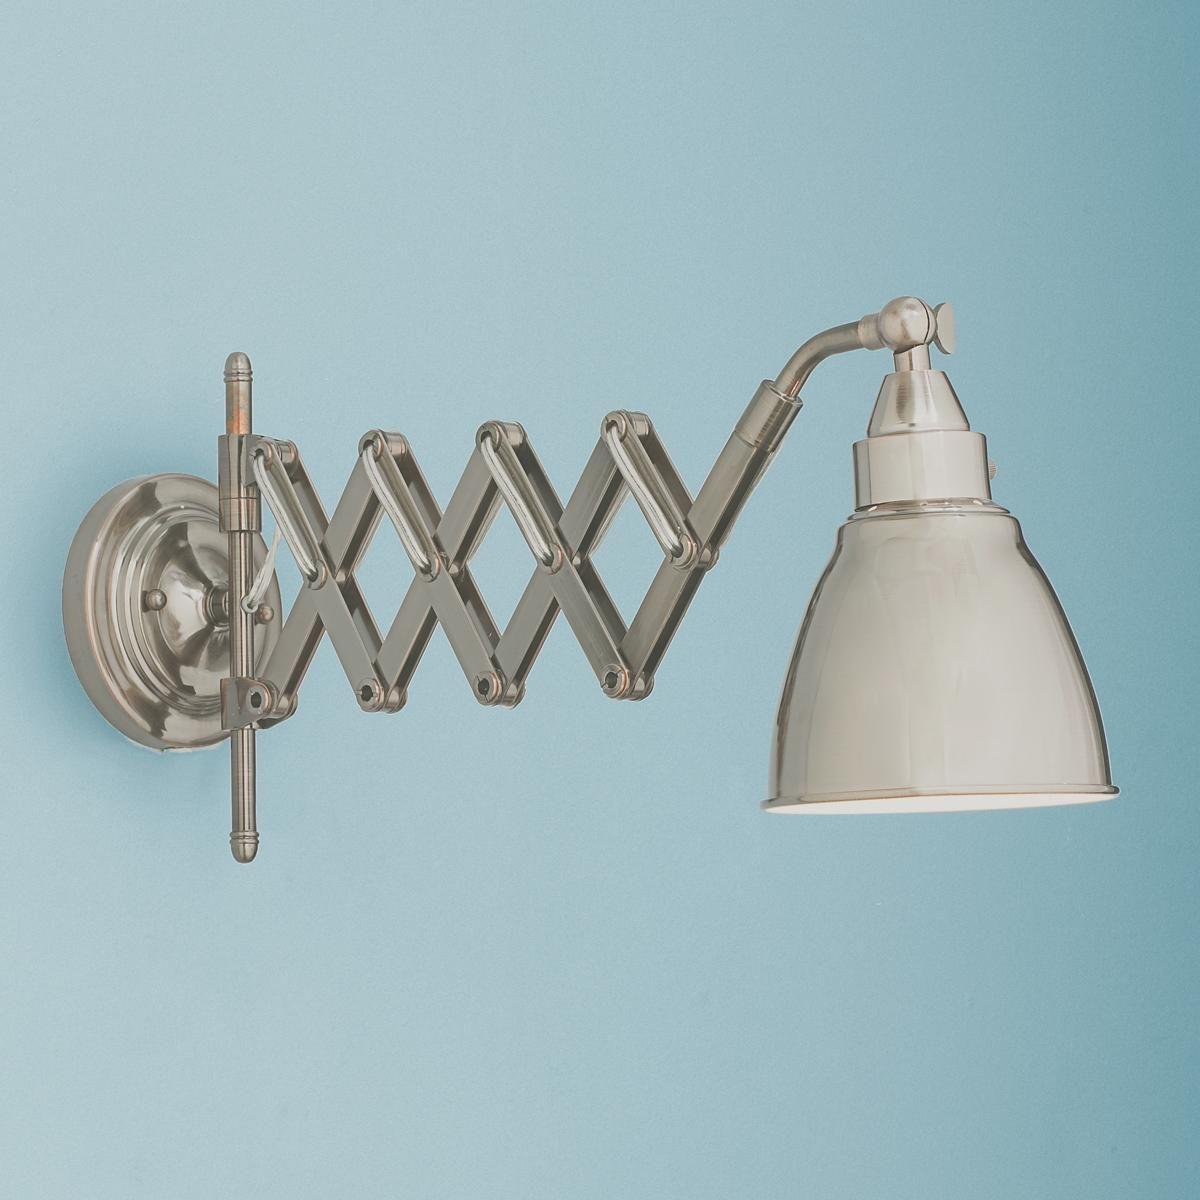 Accordion Cone Swing Arm Wall Lamp Bathroom Wall Lamp Shades